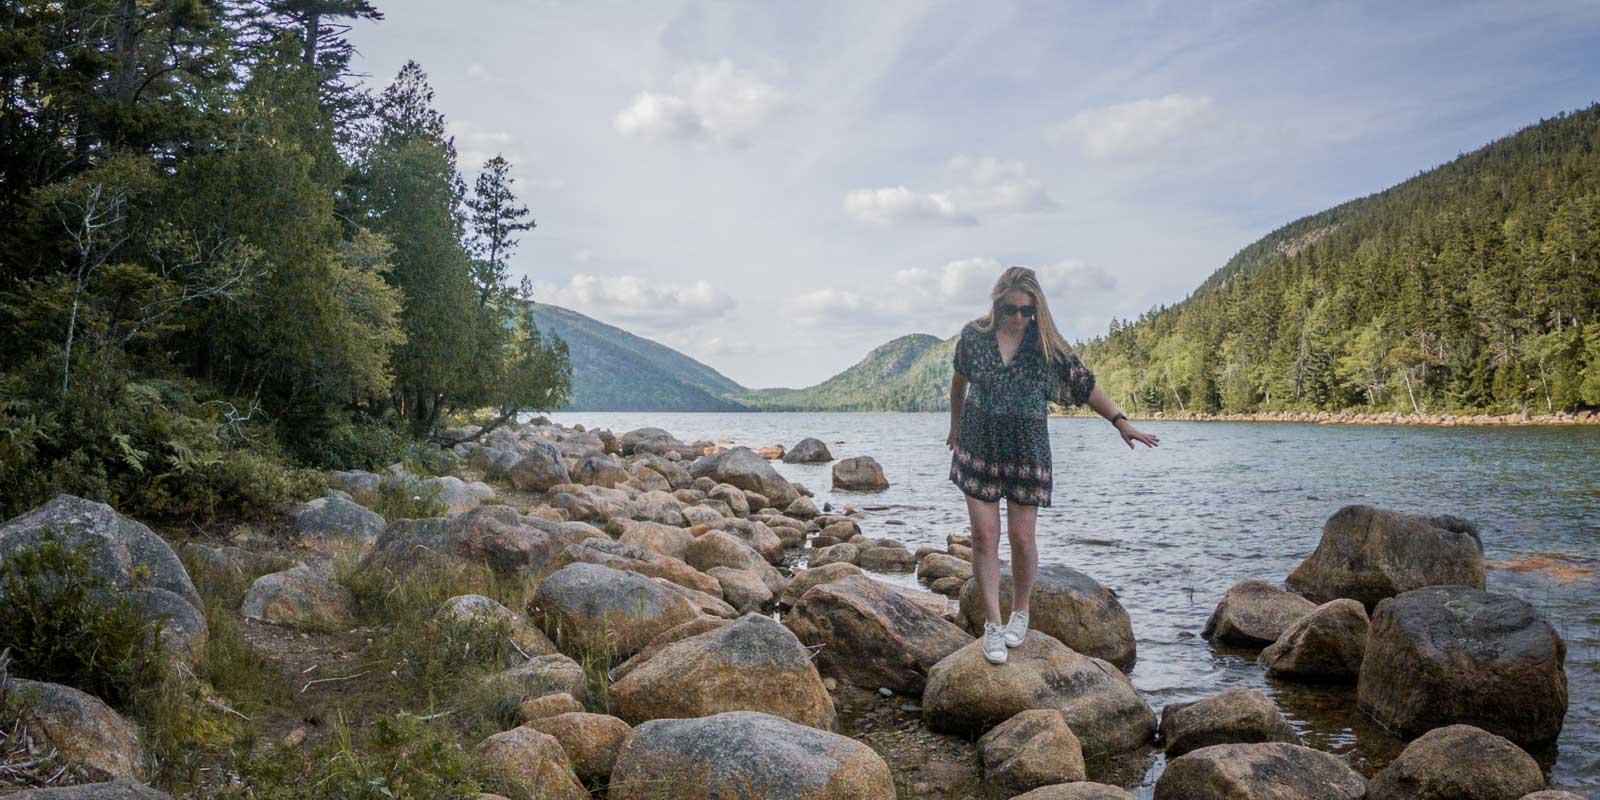 Travel blogger Meg Frost walking across rocks on the shore of Jordan Pond, while hiking the Jordan Pond trail loop in Acadia National Park, Bar Harbor, Maine.